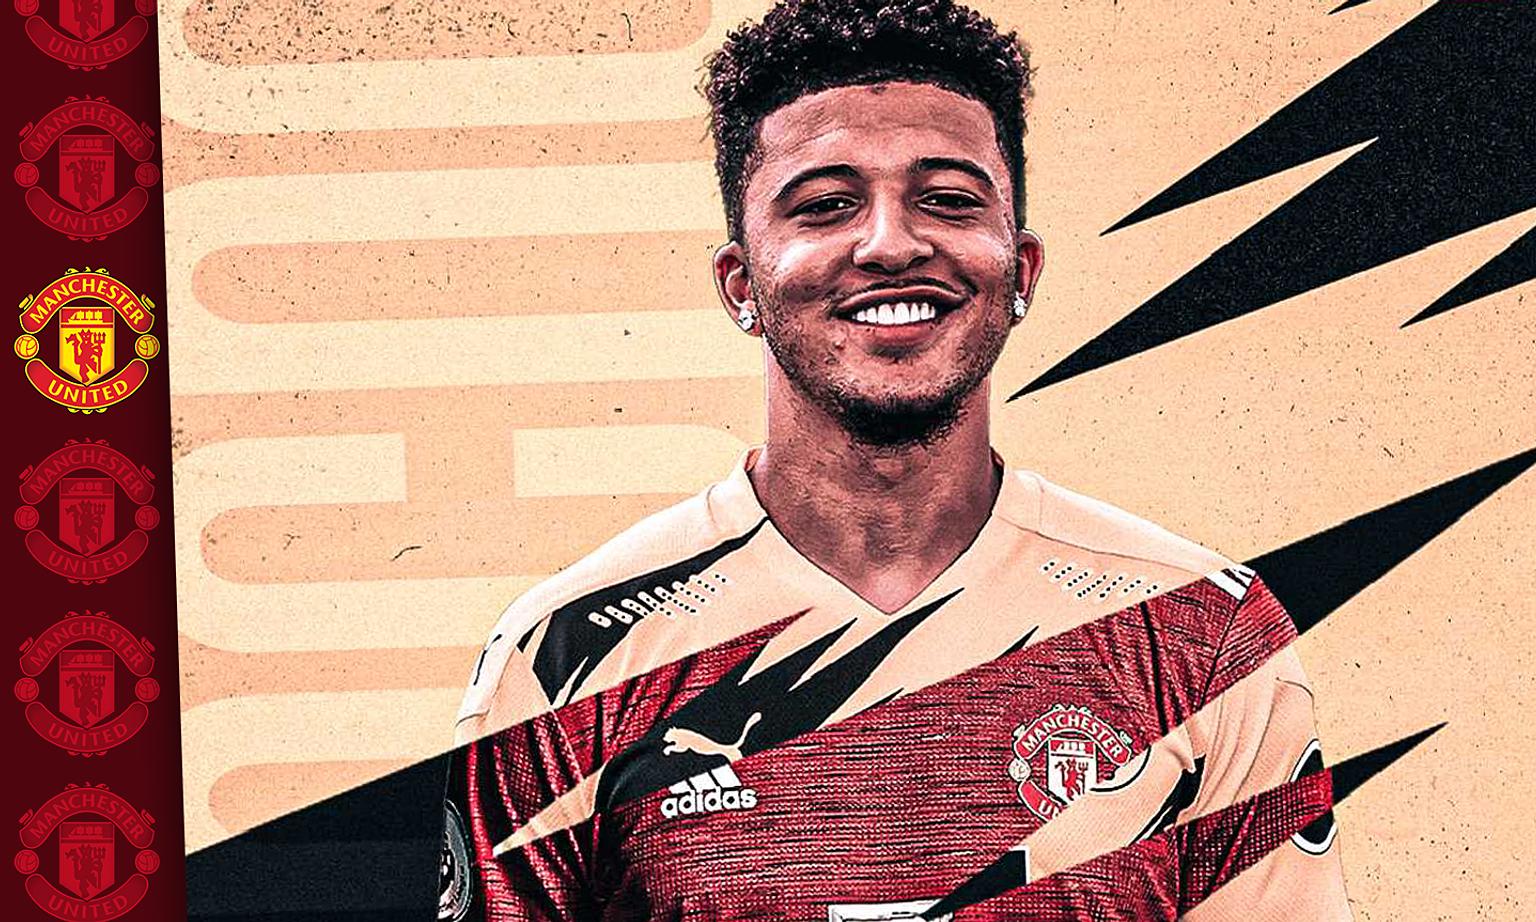 Sancho diharapkan untuk mengangkat Man Utd, memuaskan dahaga klub untuk gelar.  Foto: Sky Sports